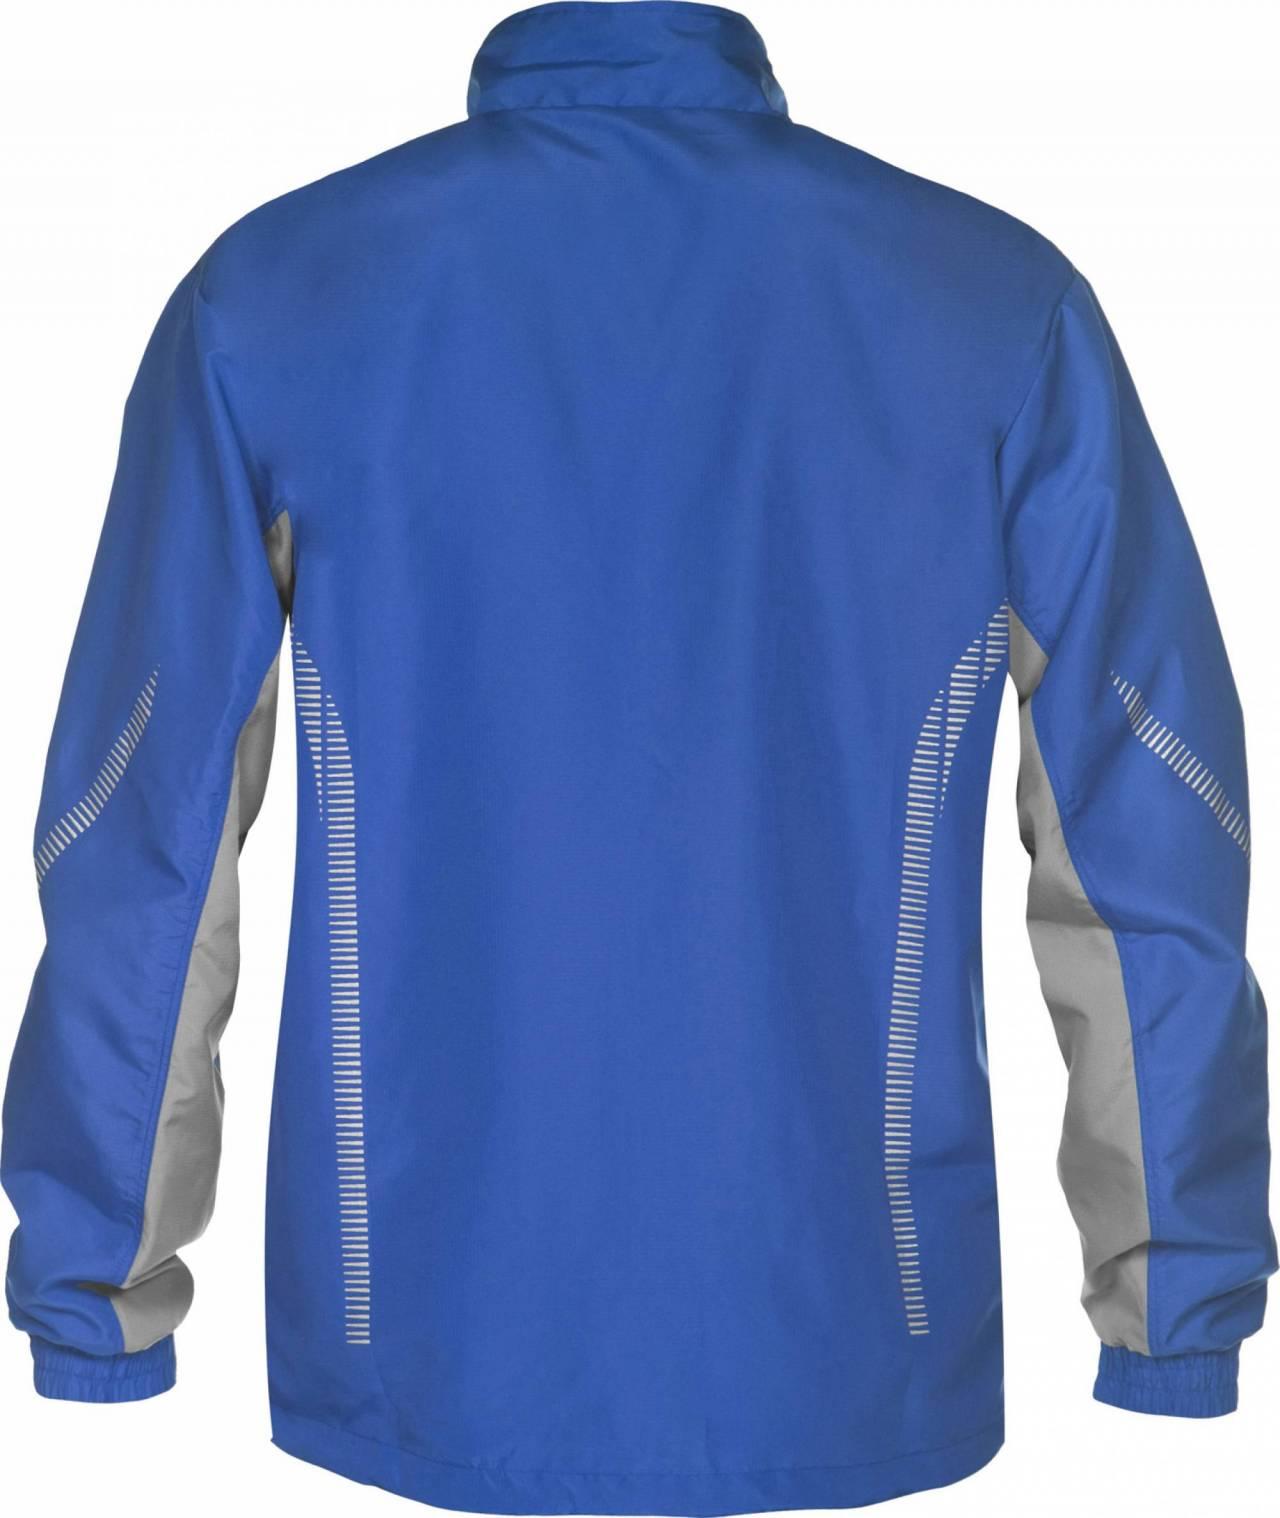 JR TL Warm up Jacket